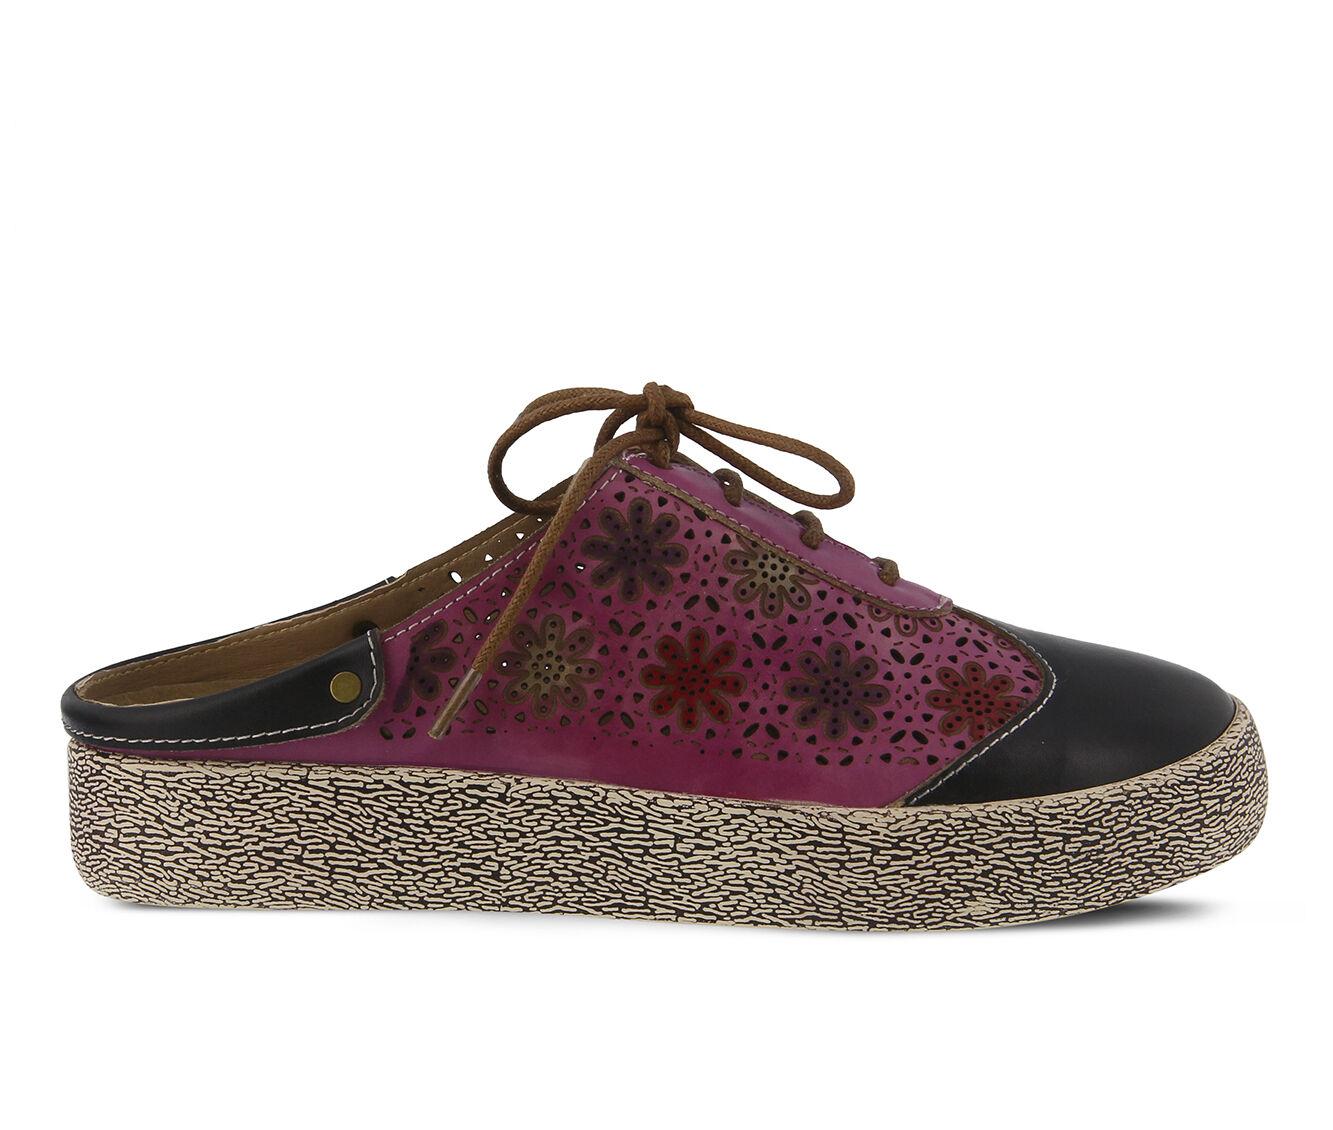 uk shoes_kd3111